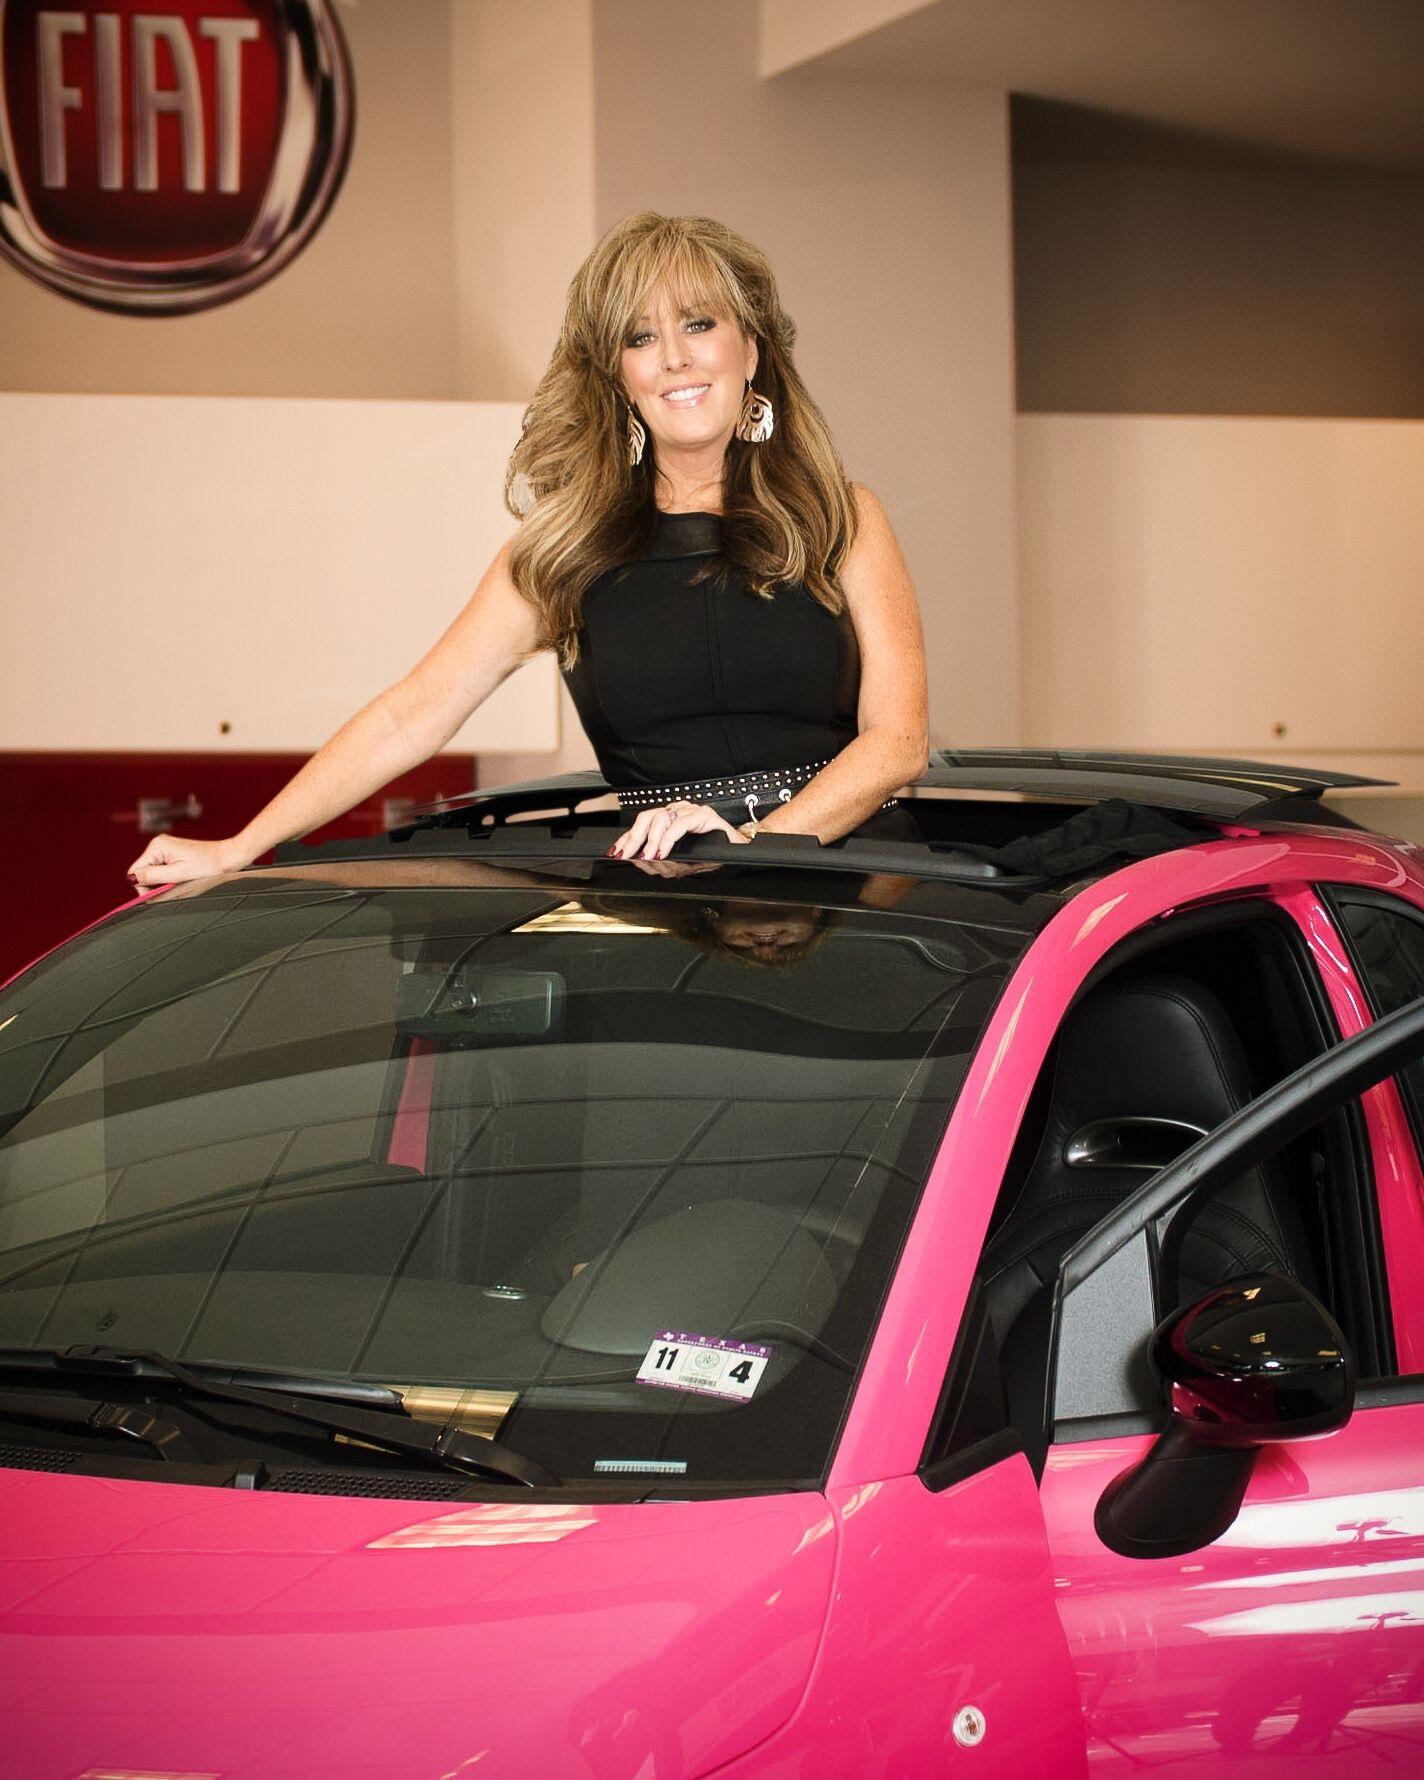 Lisa w pink car